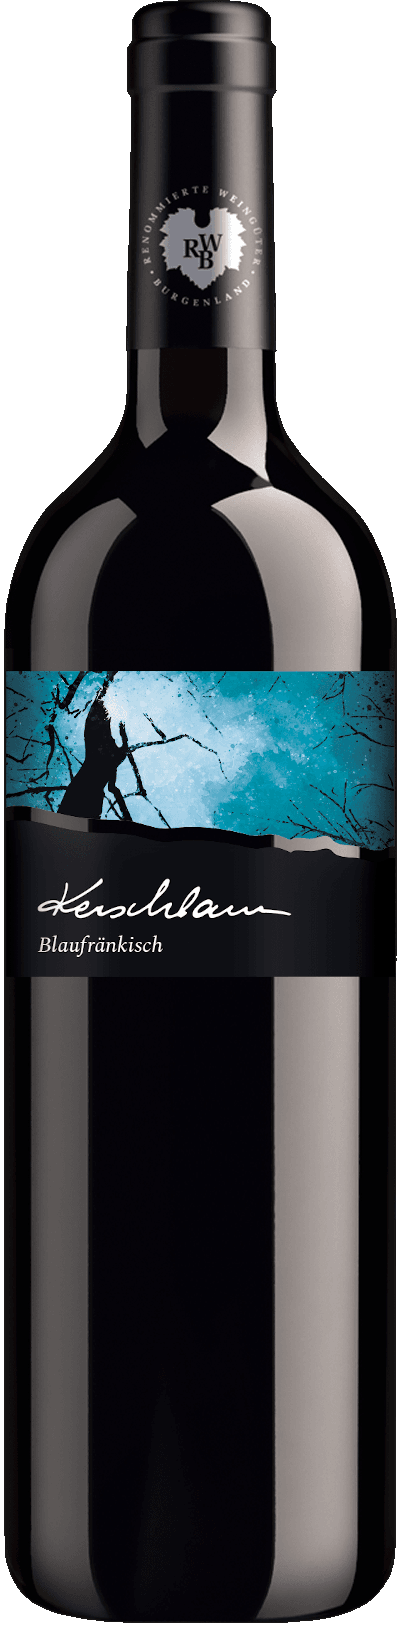 Paul Kerschbaum - Blaufränkisch